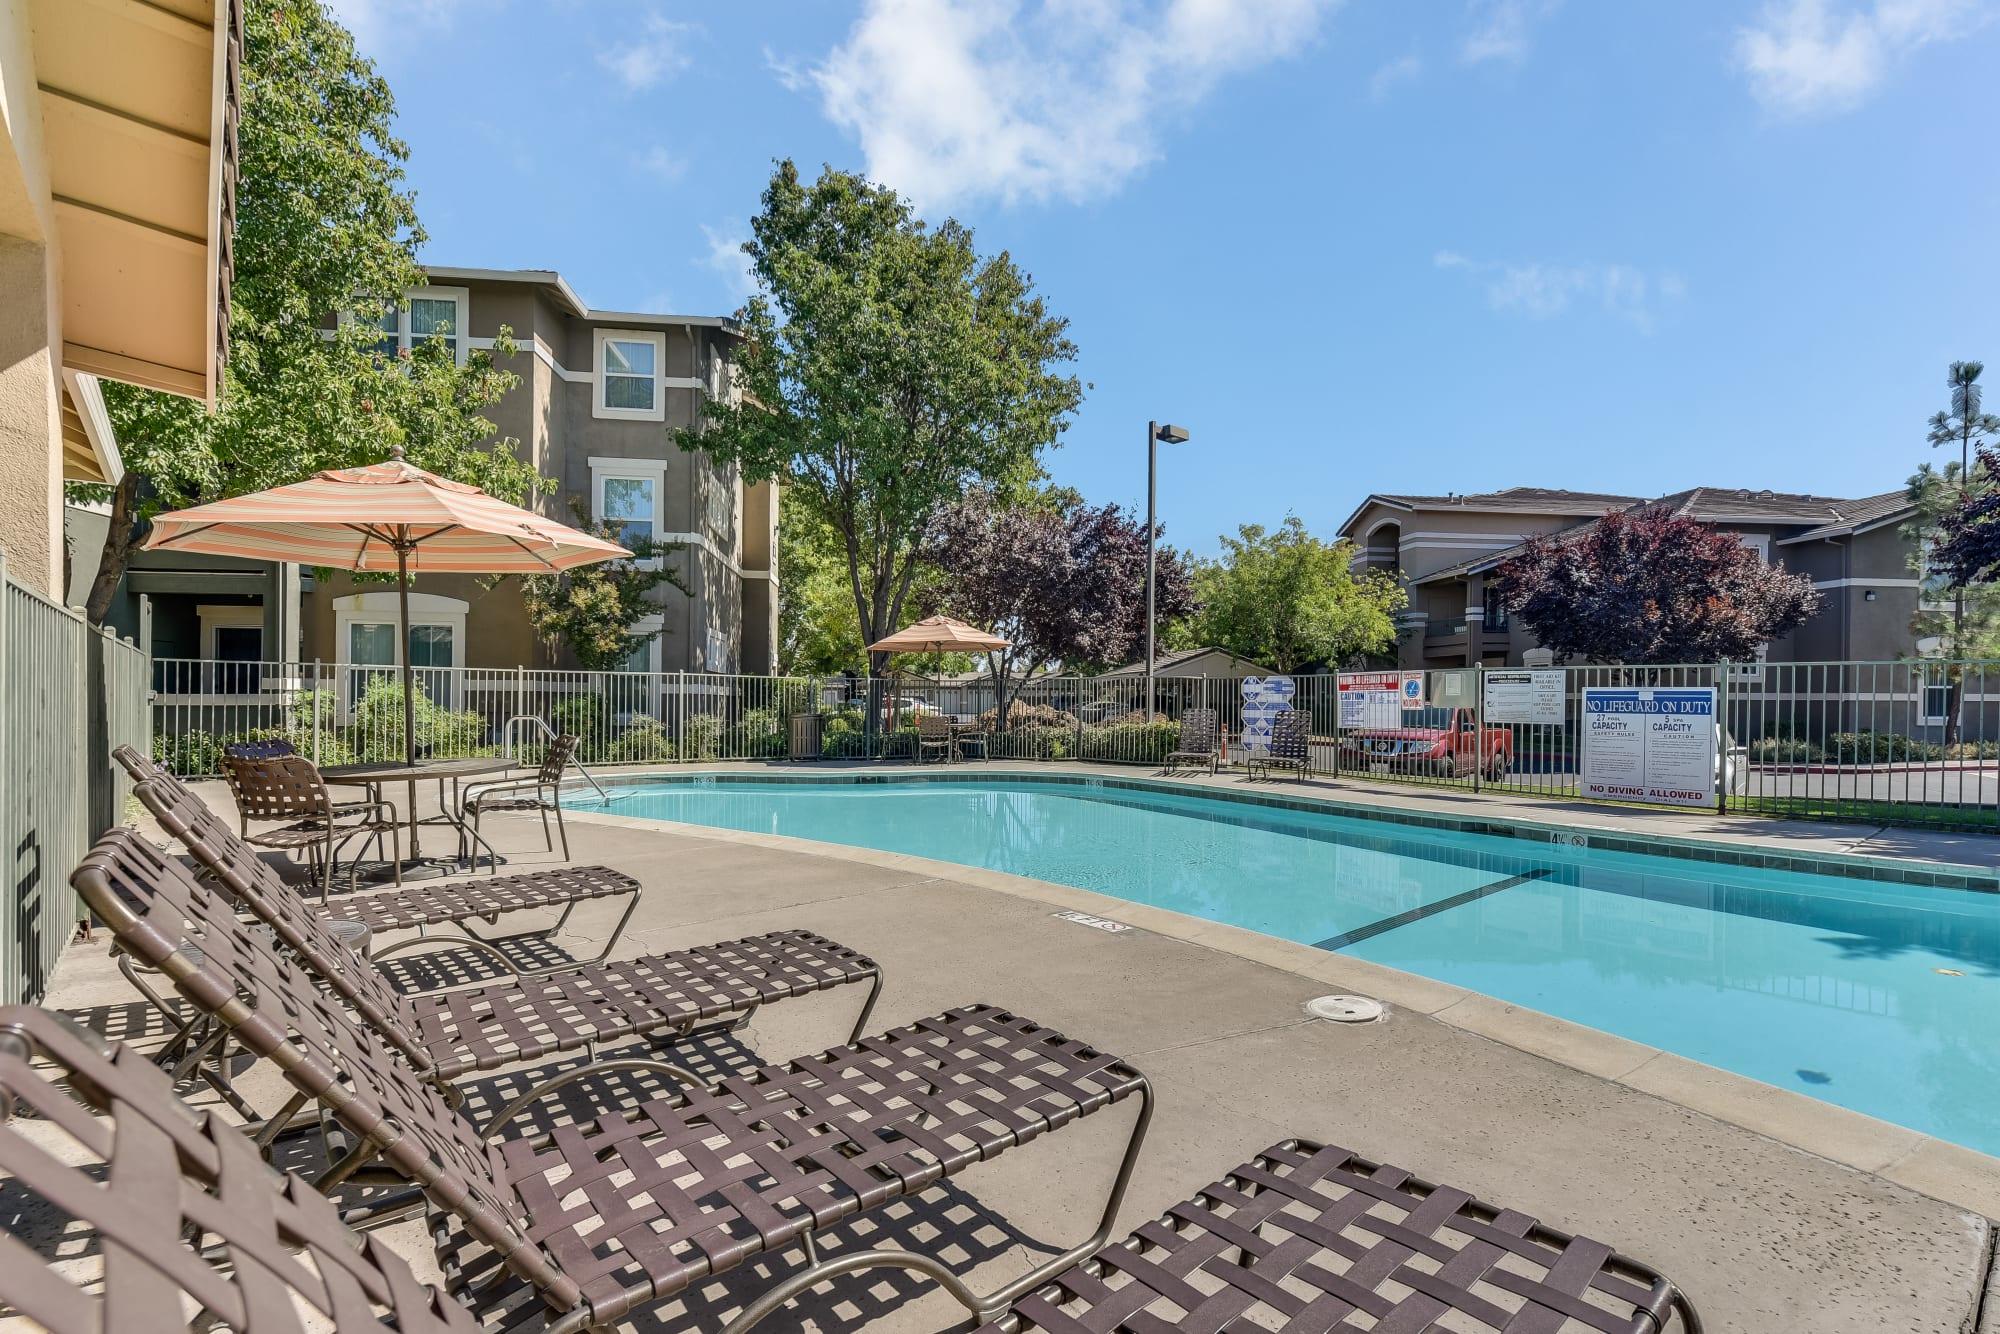 Poolside at Natomas Park Apartments in Sacramento, California